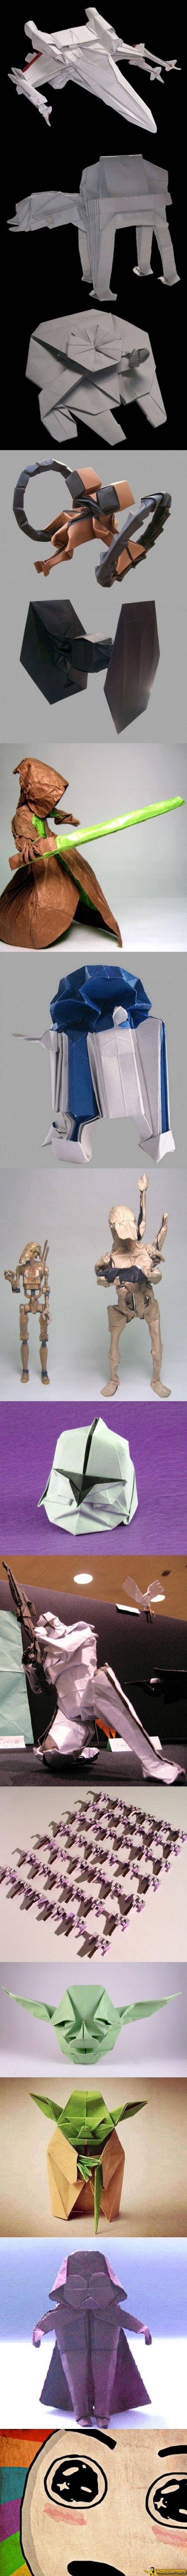 Star Wars Origami -